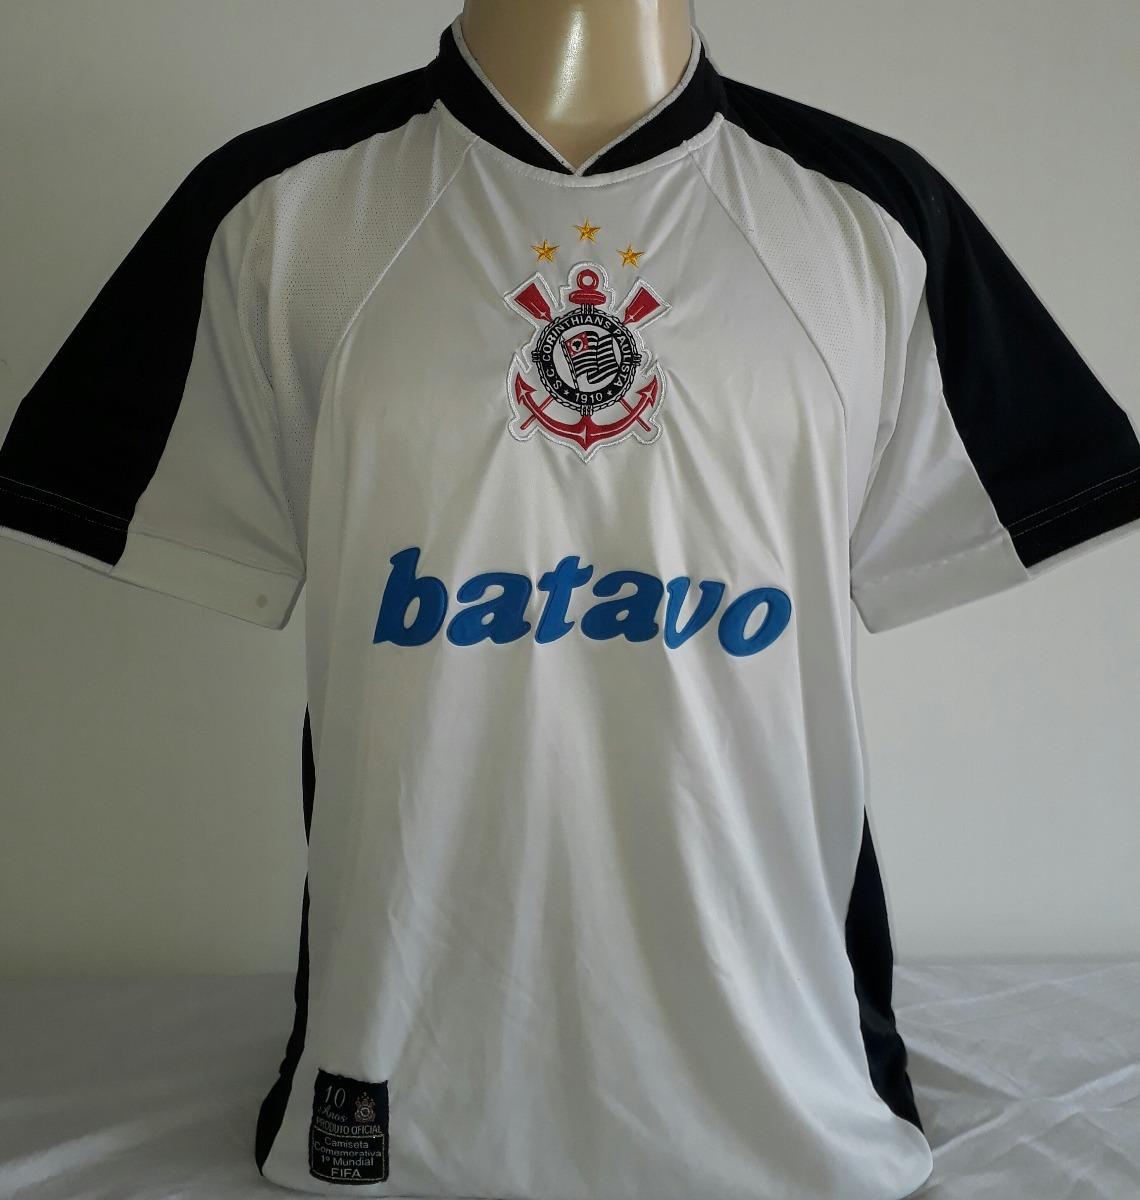 2b12cfa944 camiseta corinthians comemorativa campeão mundial 2000 0. Carregando zoom.